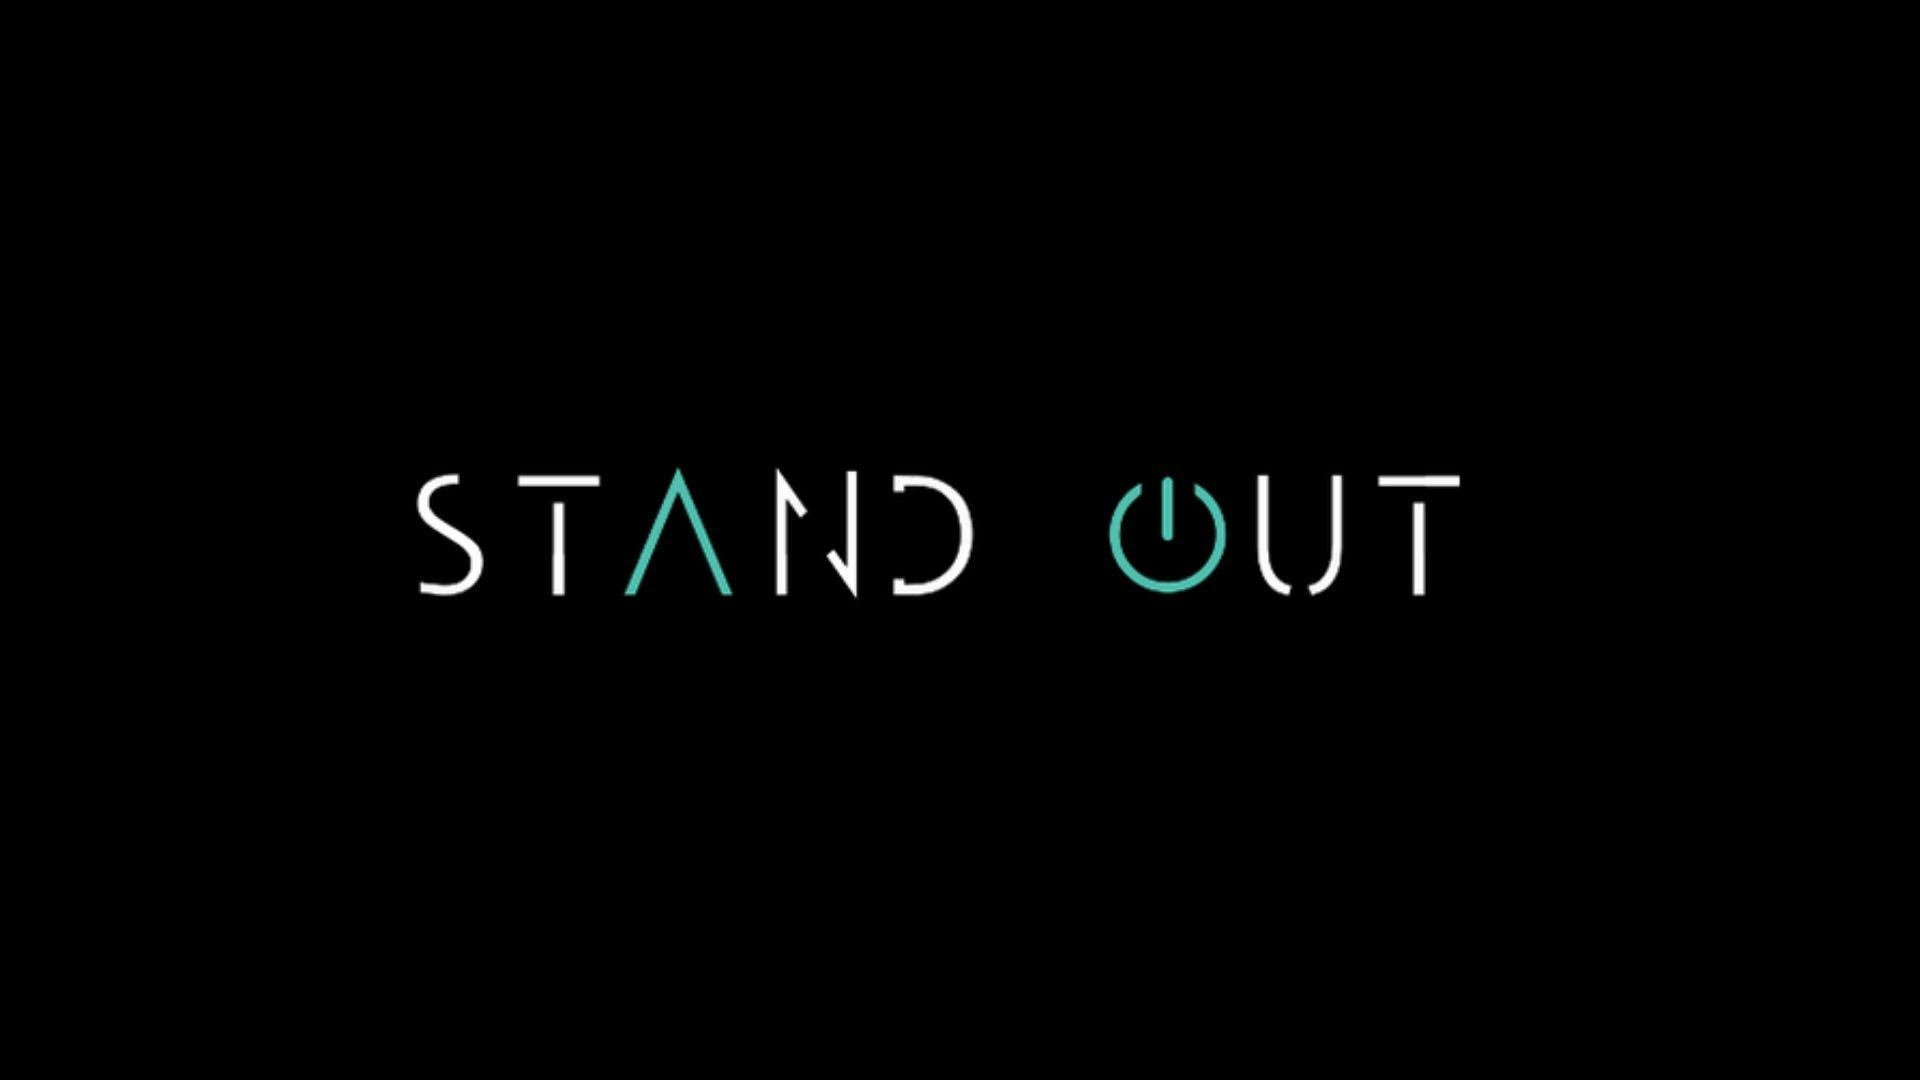 Standout Digital